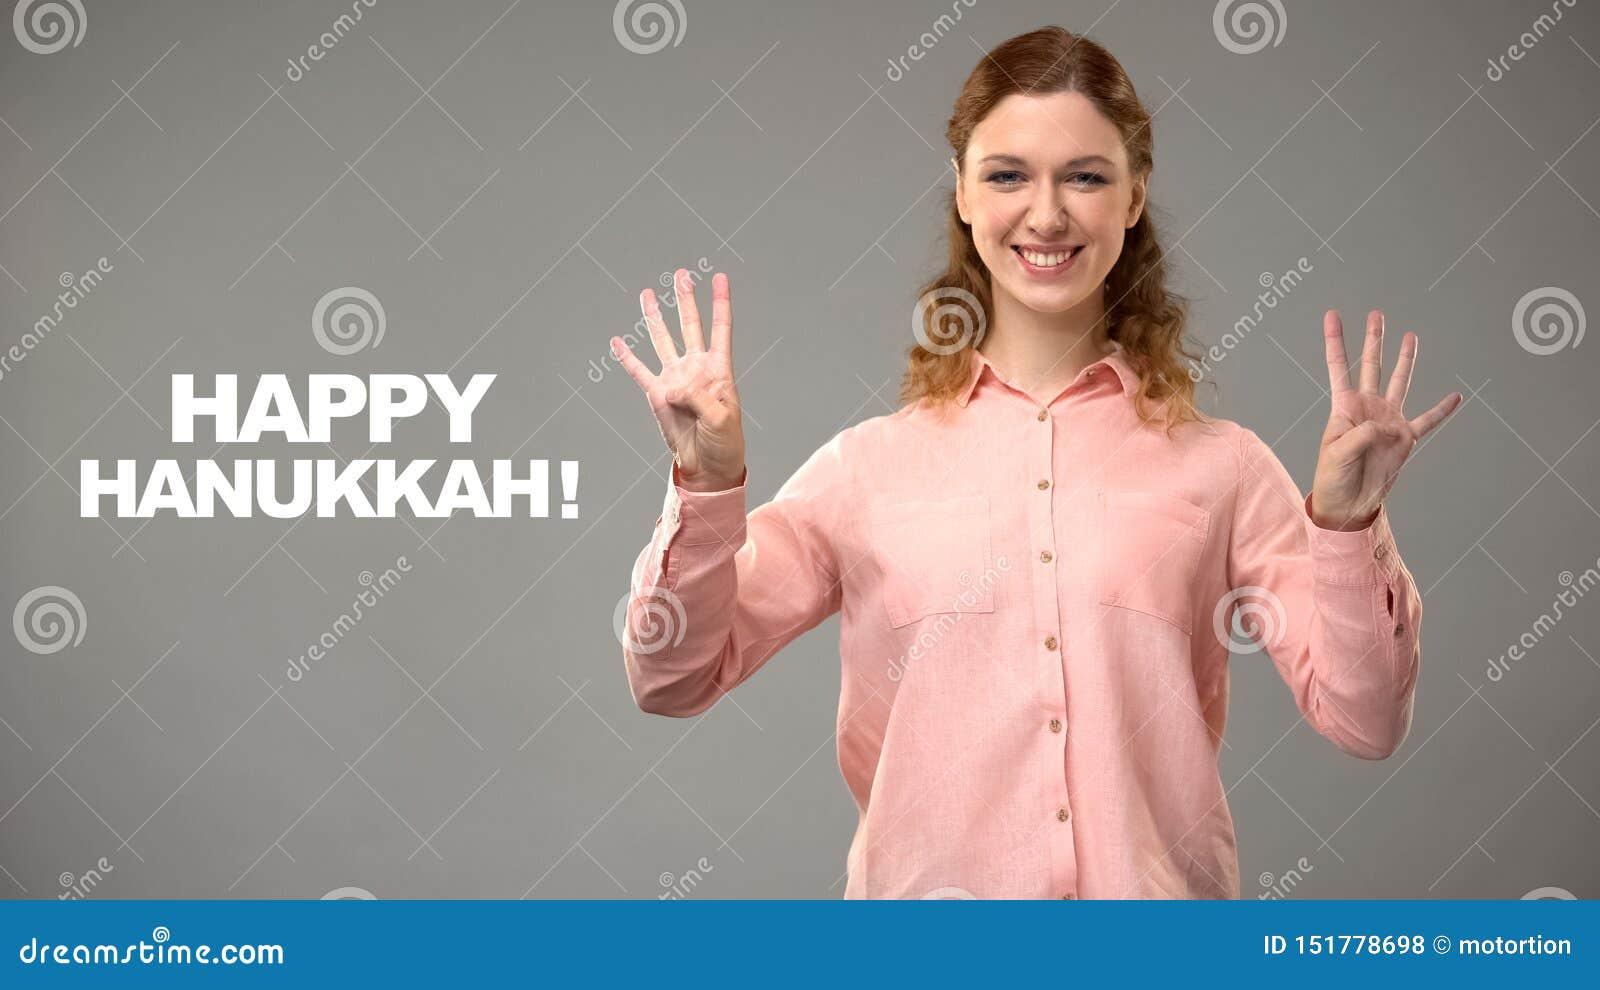 Female saying happy hanukkah in sign language, text on background, communication